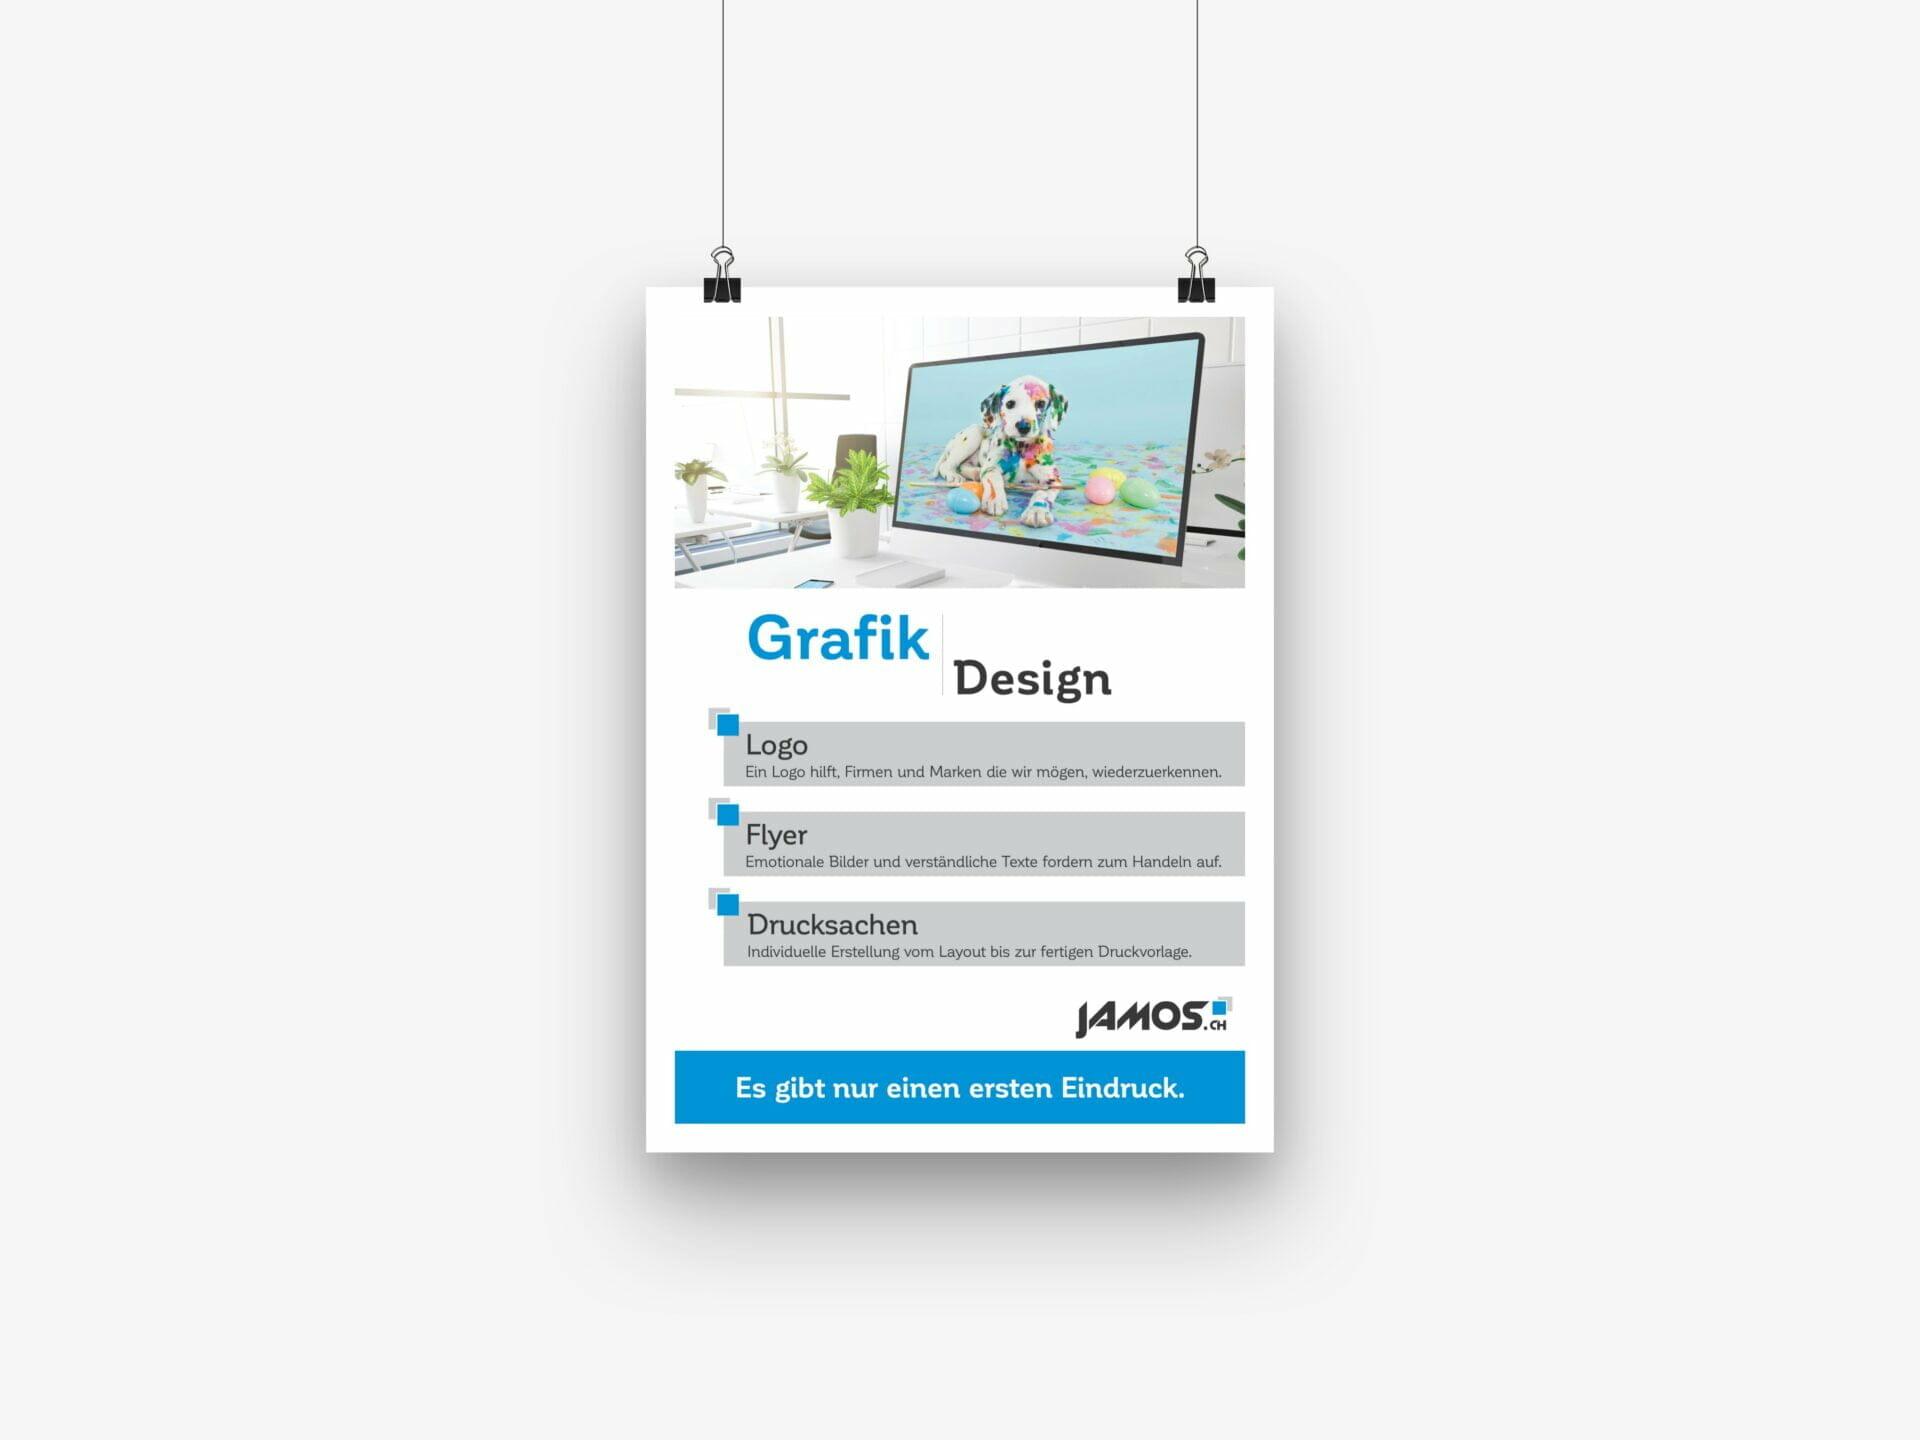 JAMOS Grafik Design